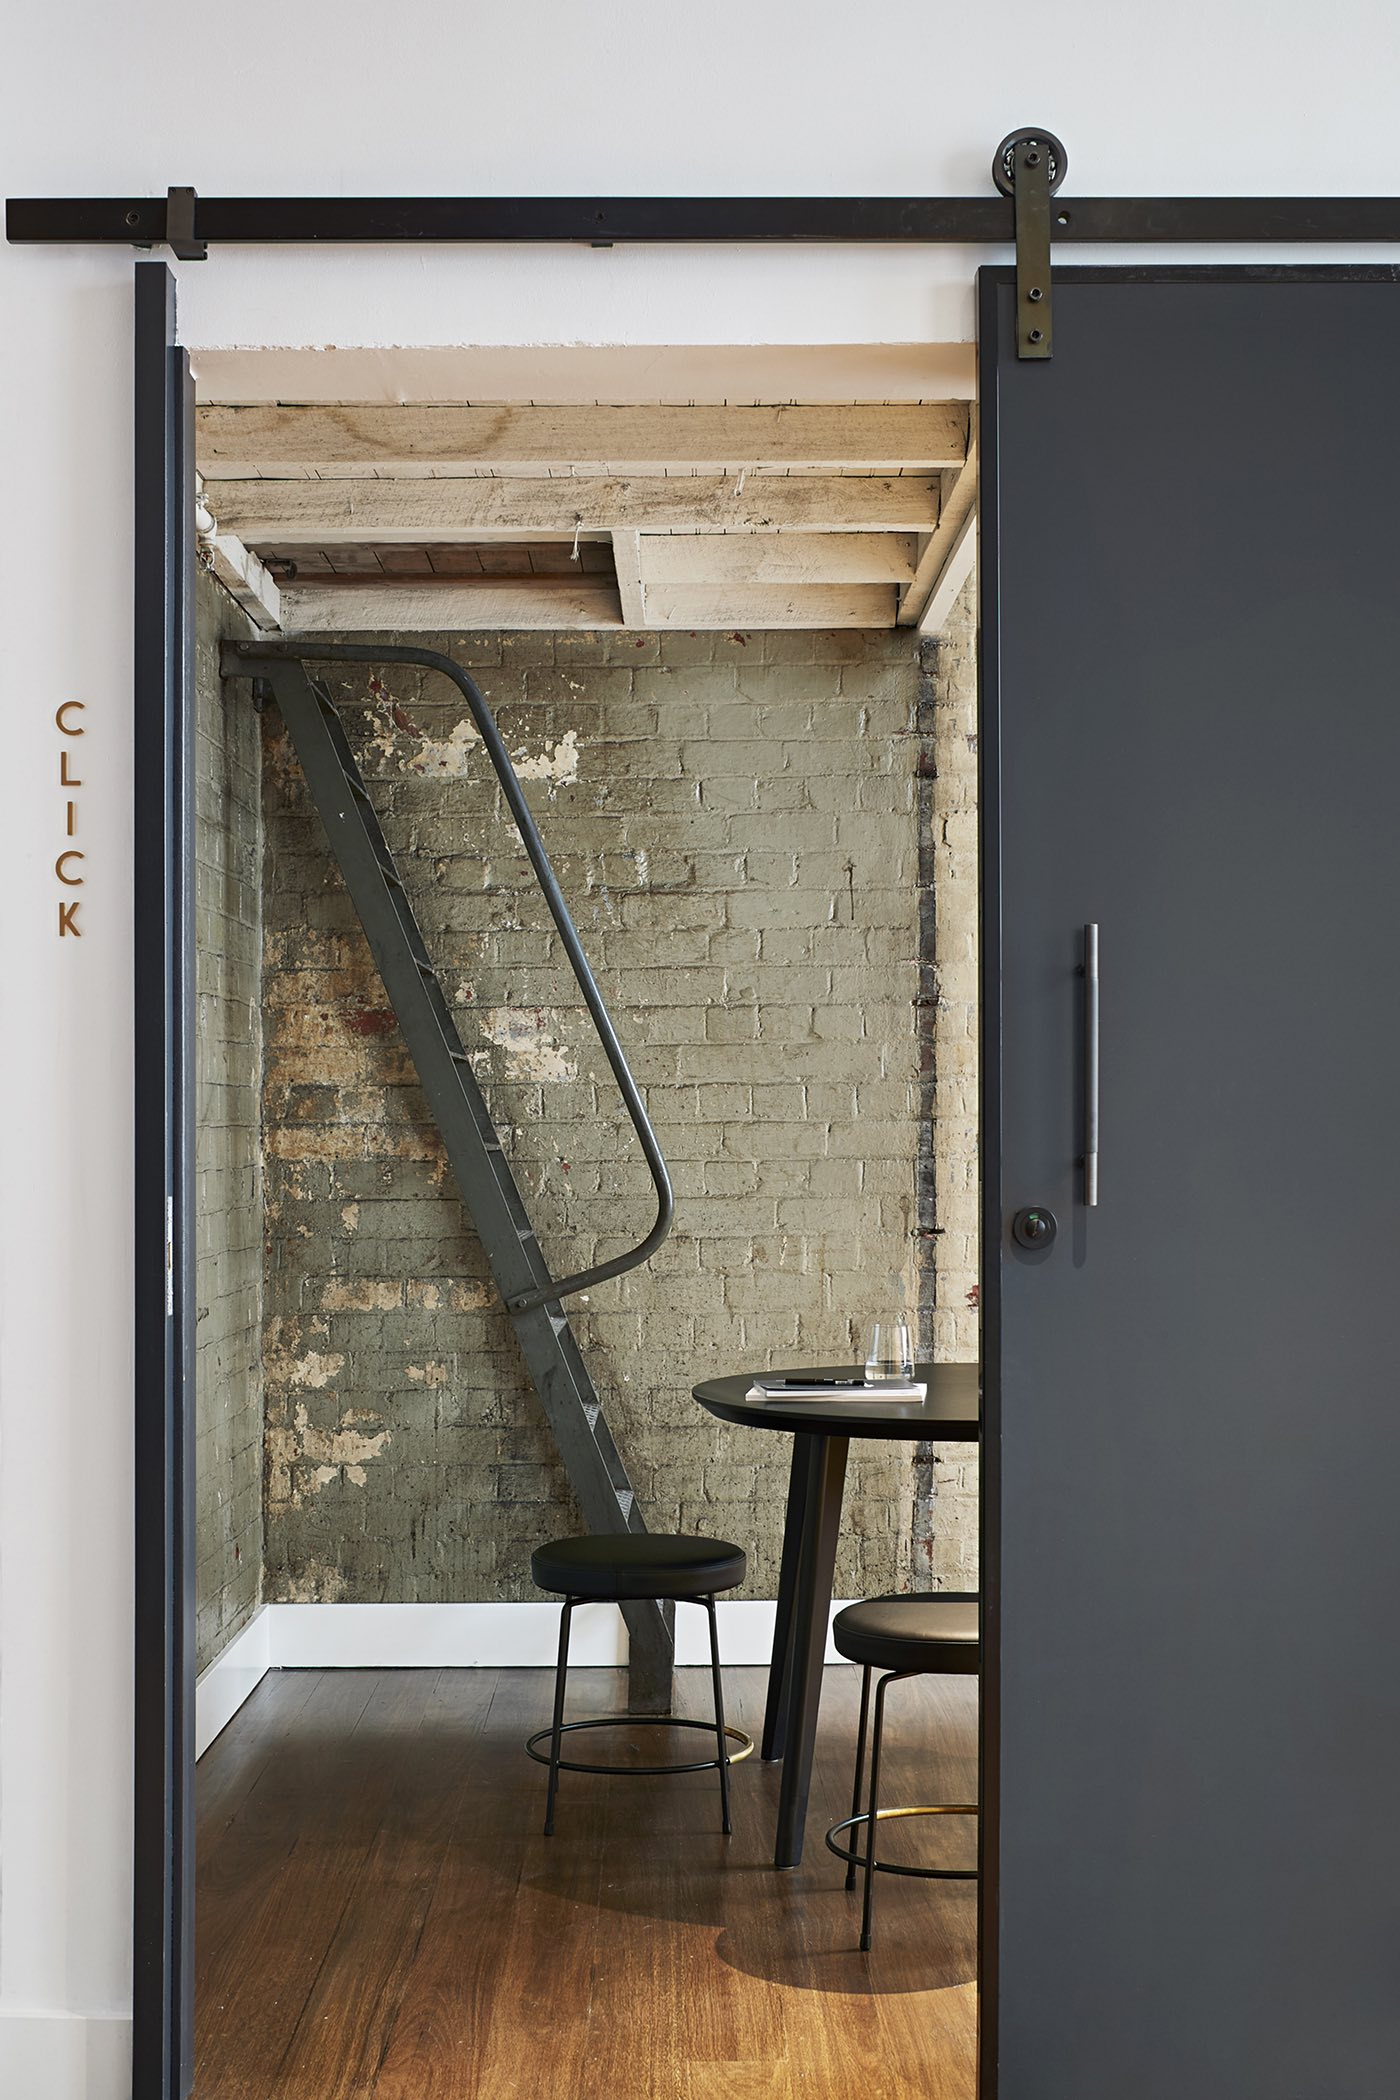 plus-architecture-melbourne-office-3